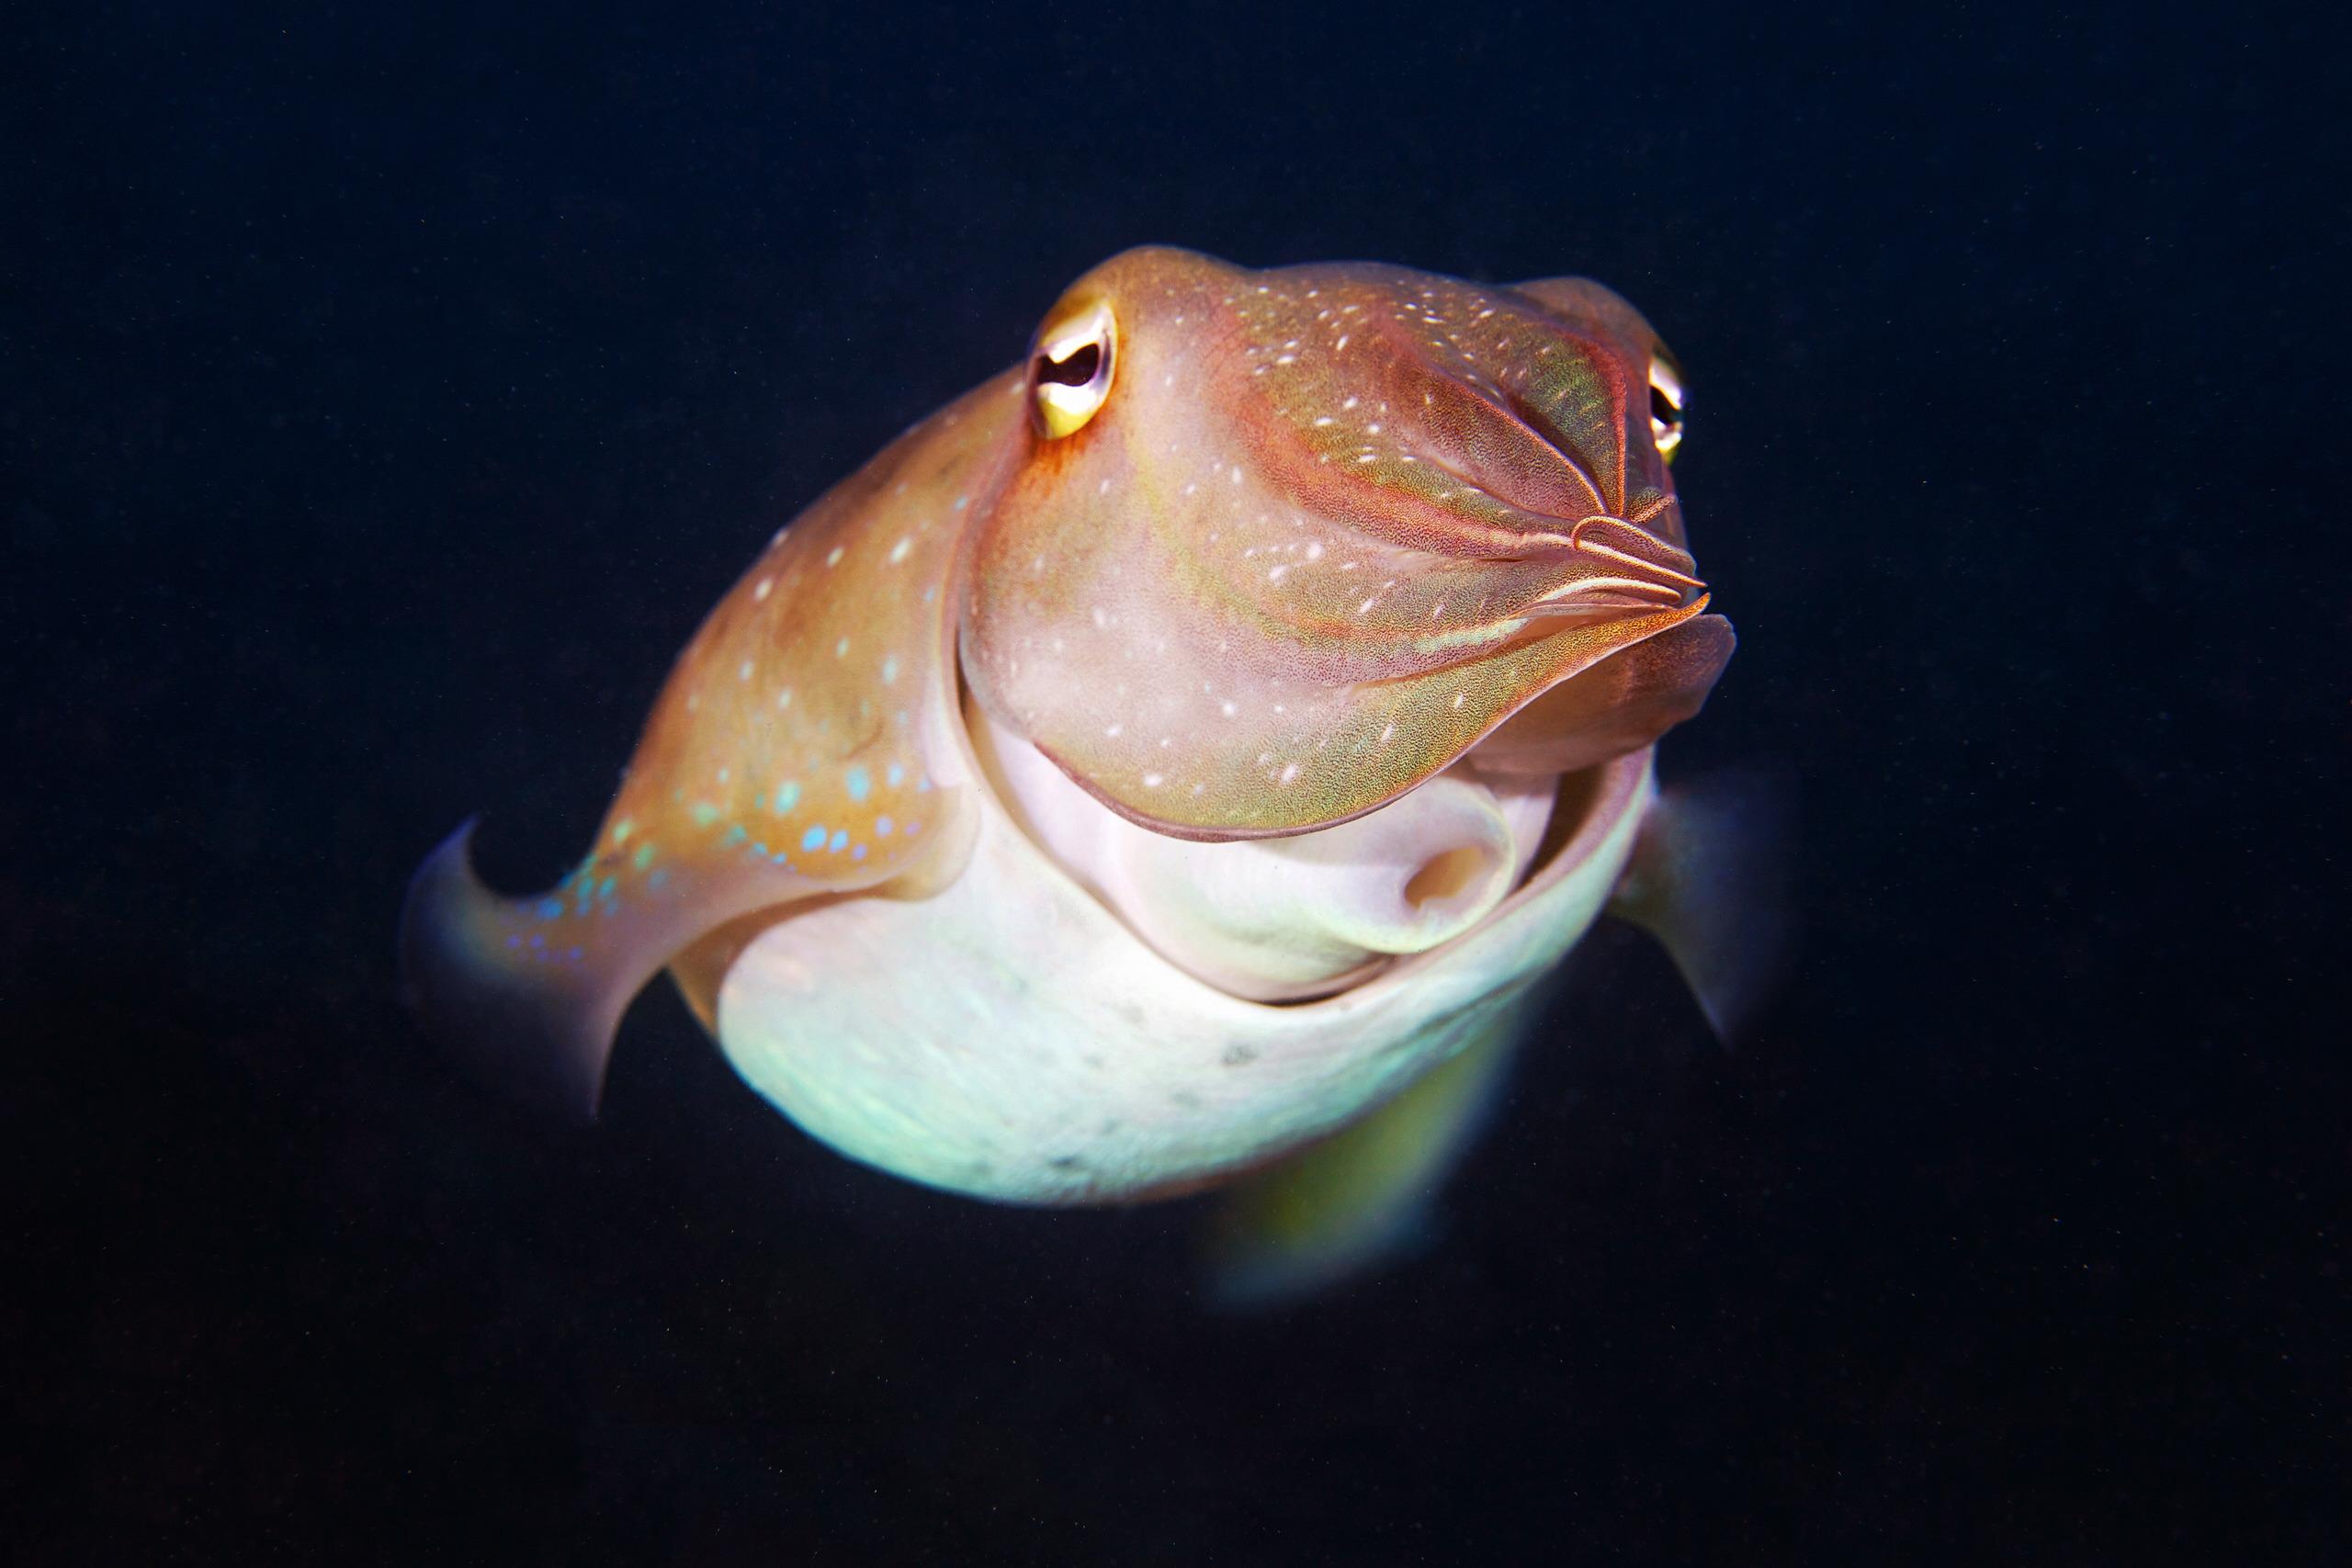 Cephalopoda – Giant cuttlefish – Sepia 2